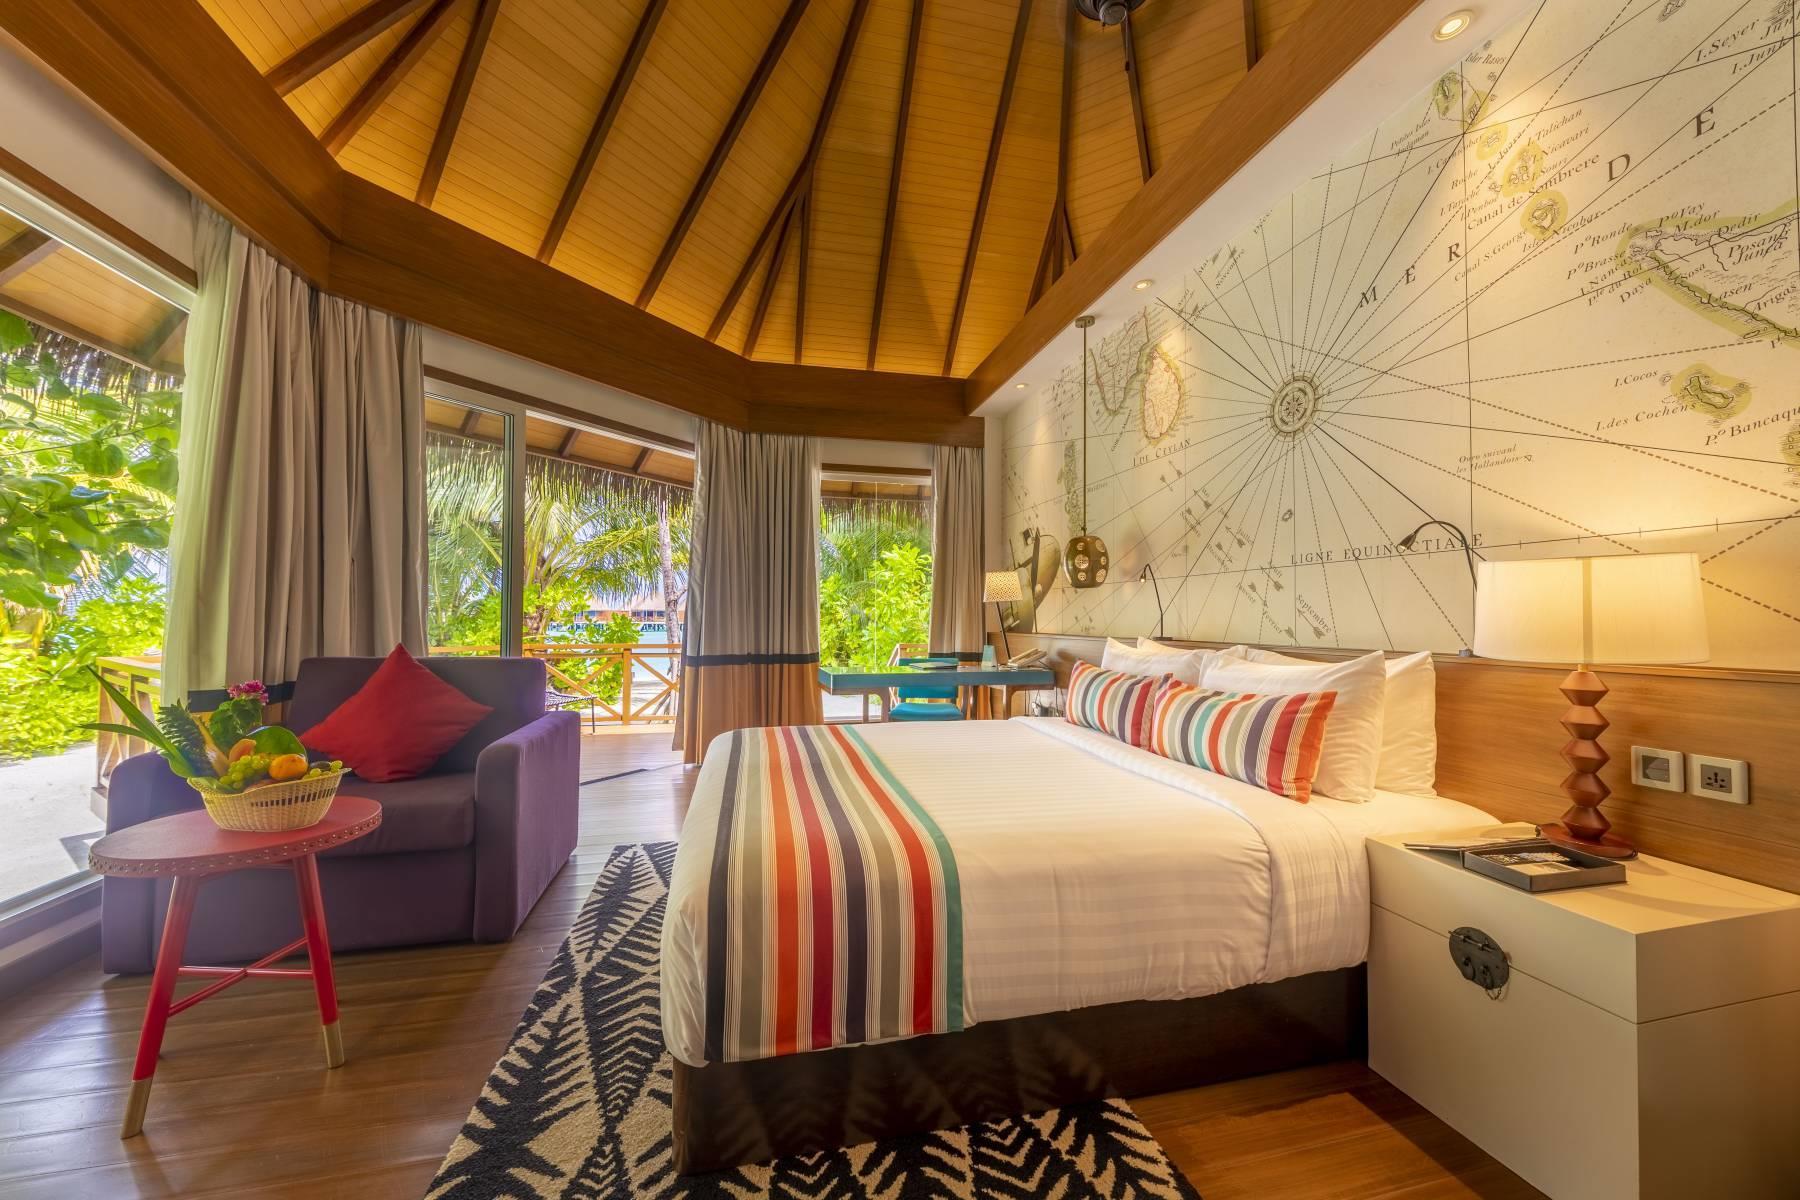 mercure-maldives-kooddoo-resort-genel-0013